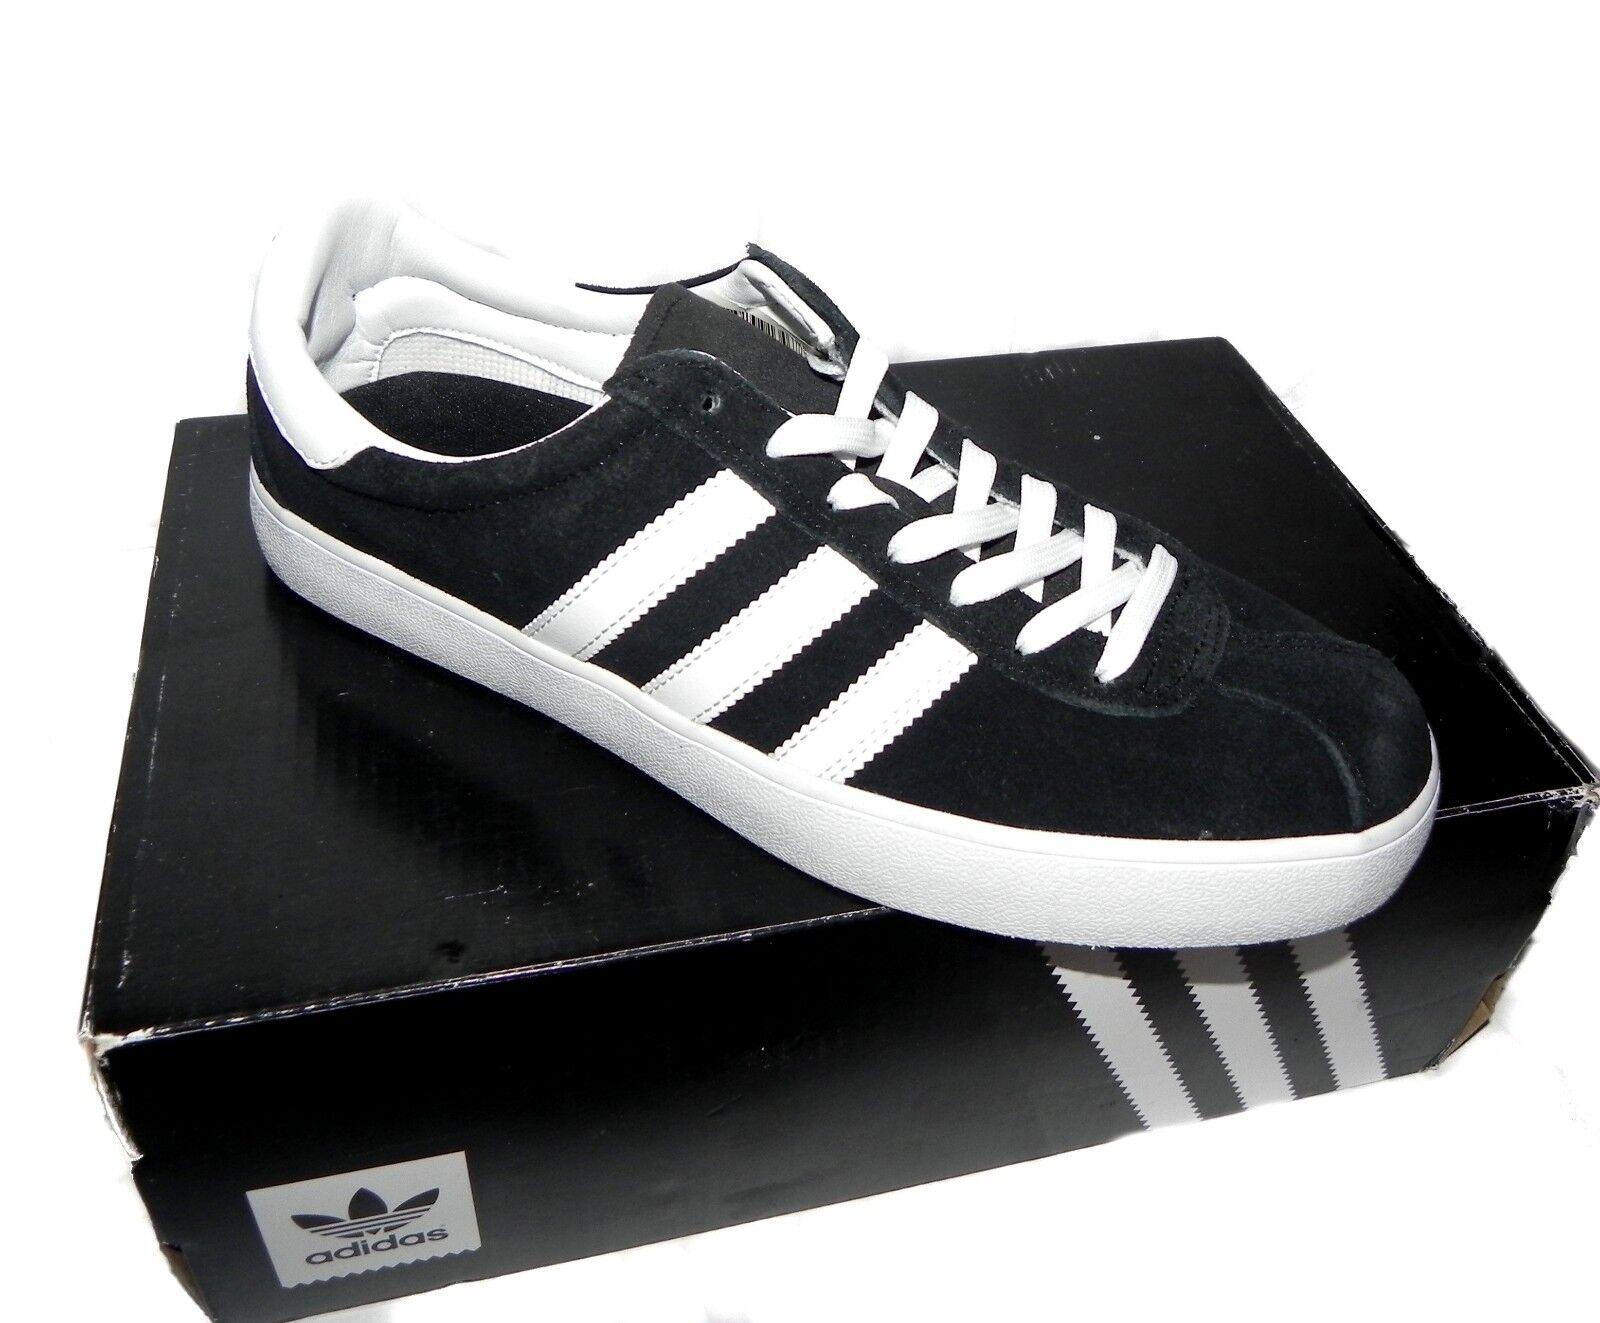 Adidas Men's Skate ADV Black White Sneakers size 8.5 BB87New With Box